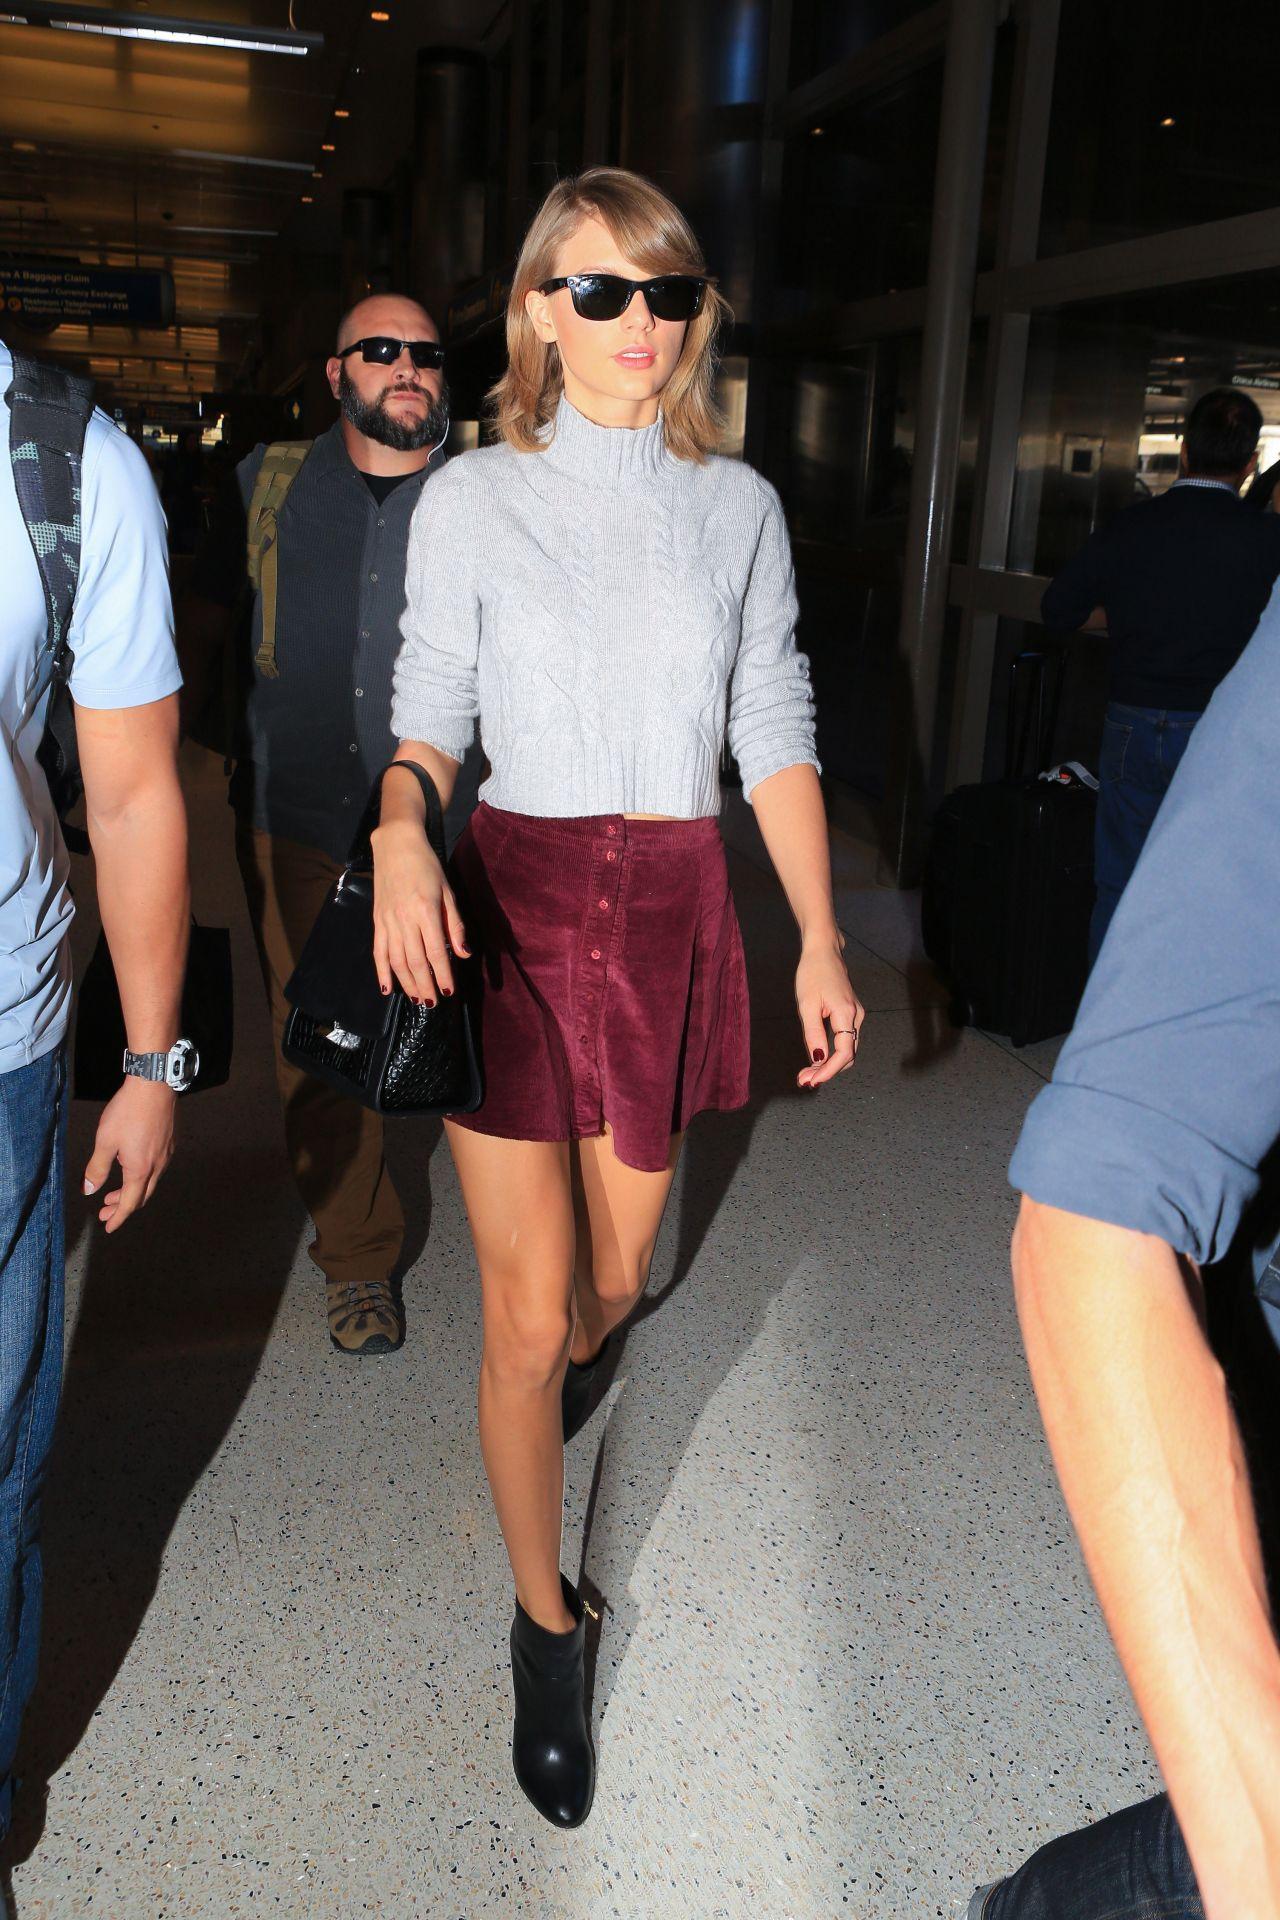 Taylor Swift Leggy In Mini Skirt Lax Airport November 2015